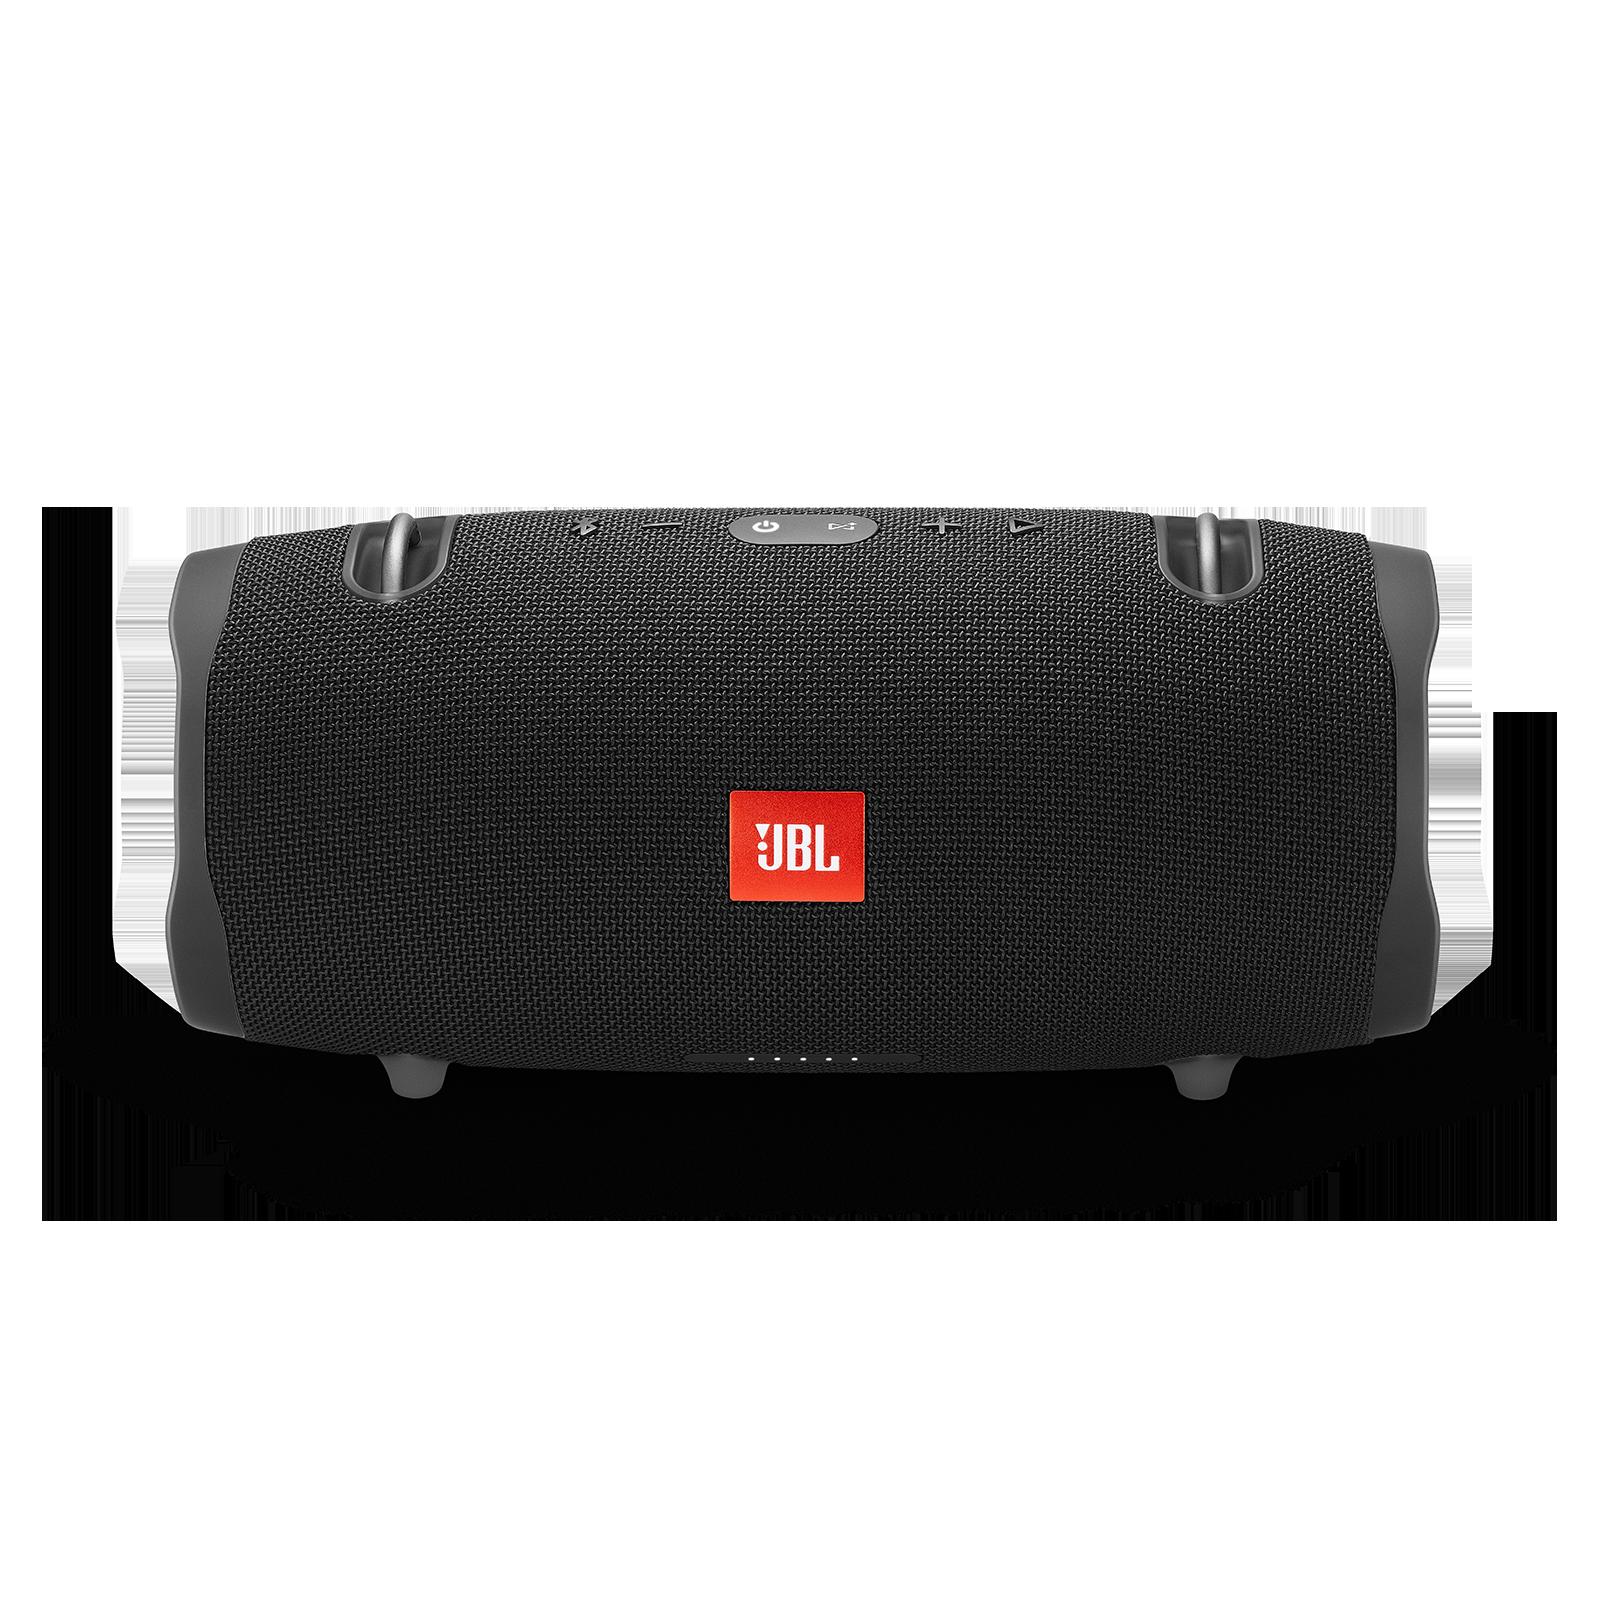 JBL Xtreme2 Portable Wireless Bluetooth Speaker